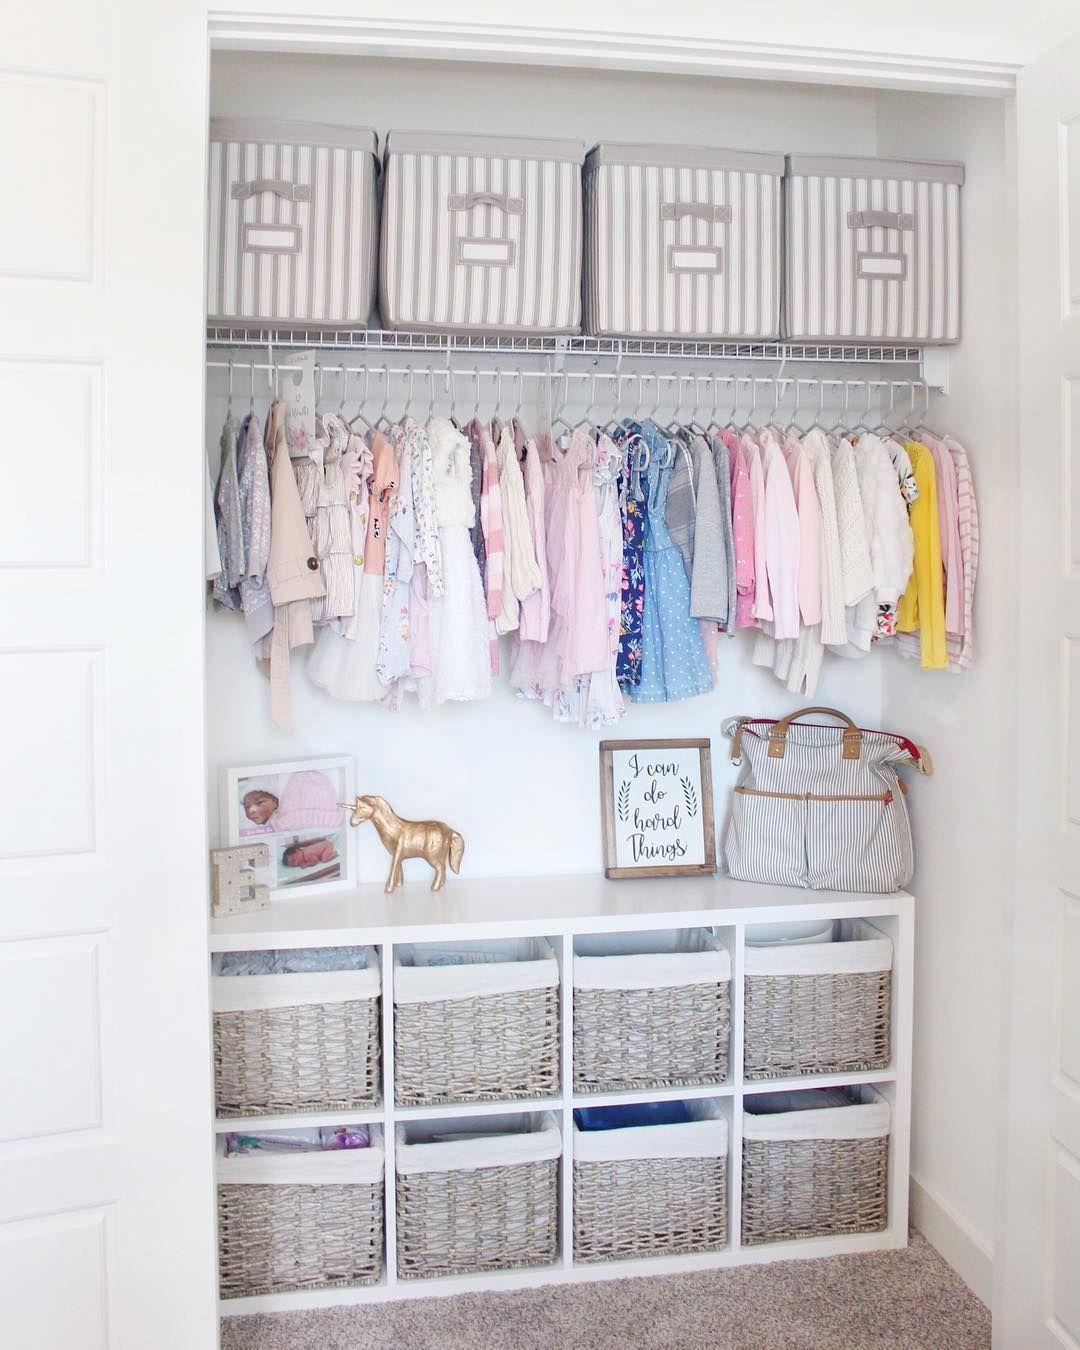 Stylish Storage Ideas For Small Bedrooms: 8 Stylish Children's Wardrobe And Closet Ideas